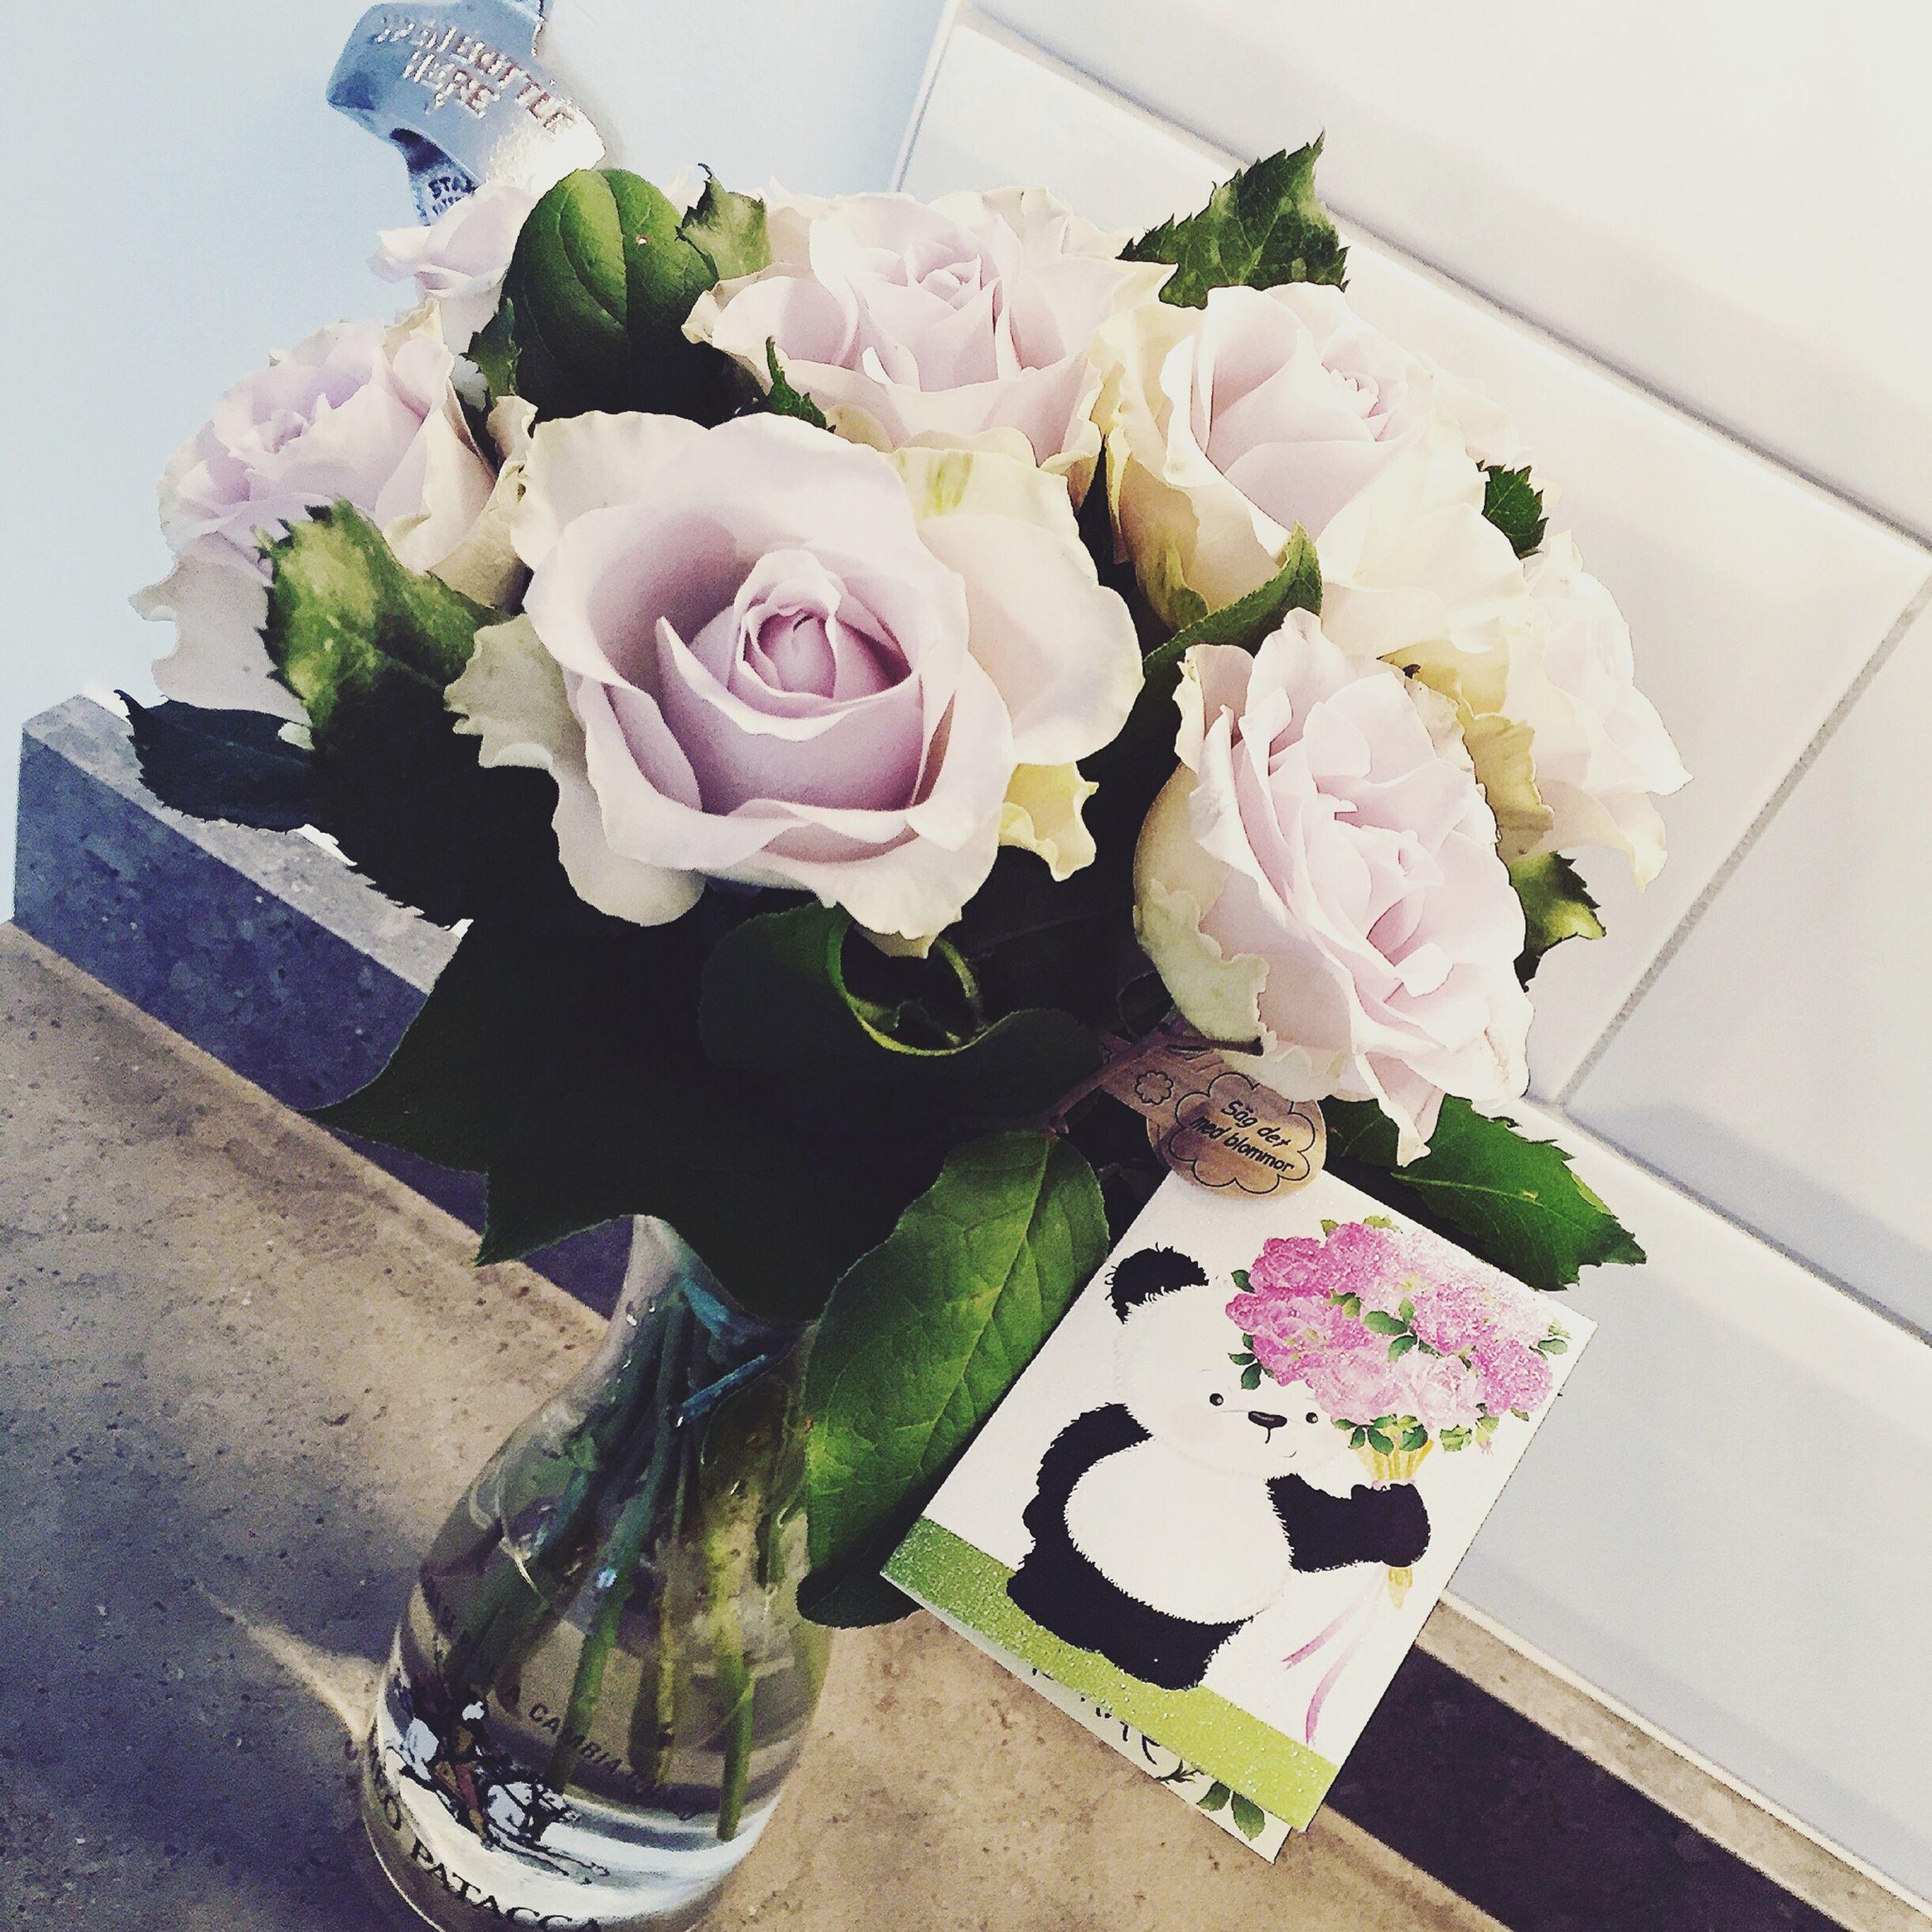 flower, indoors, vase, freshness, table, still life, fragility, petal, bouquet, decoration, variation, rose - flower, flower arrangement, flower head, bunch of flowers, pink color, high angle view, close-up, arrangement, multi colored